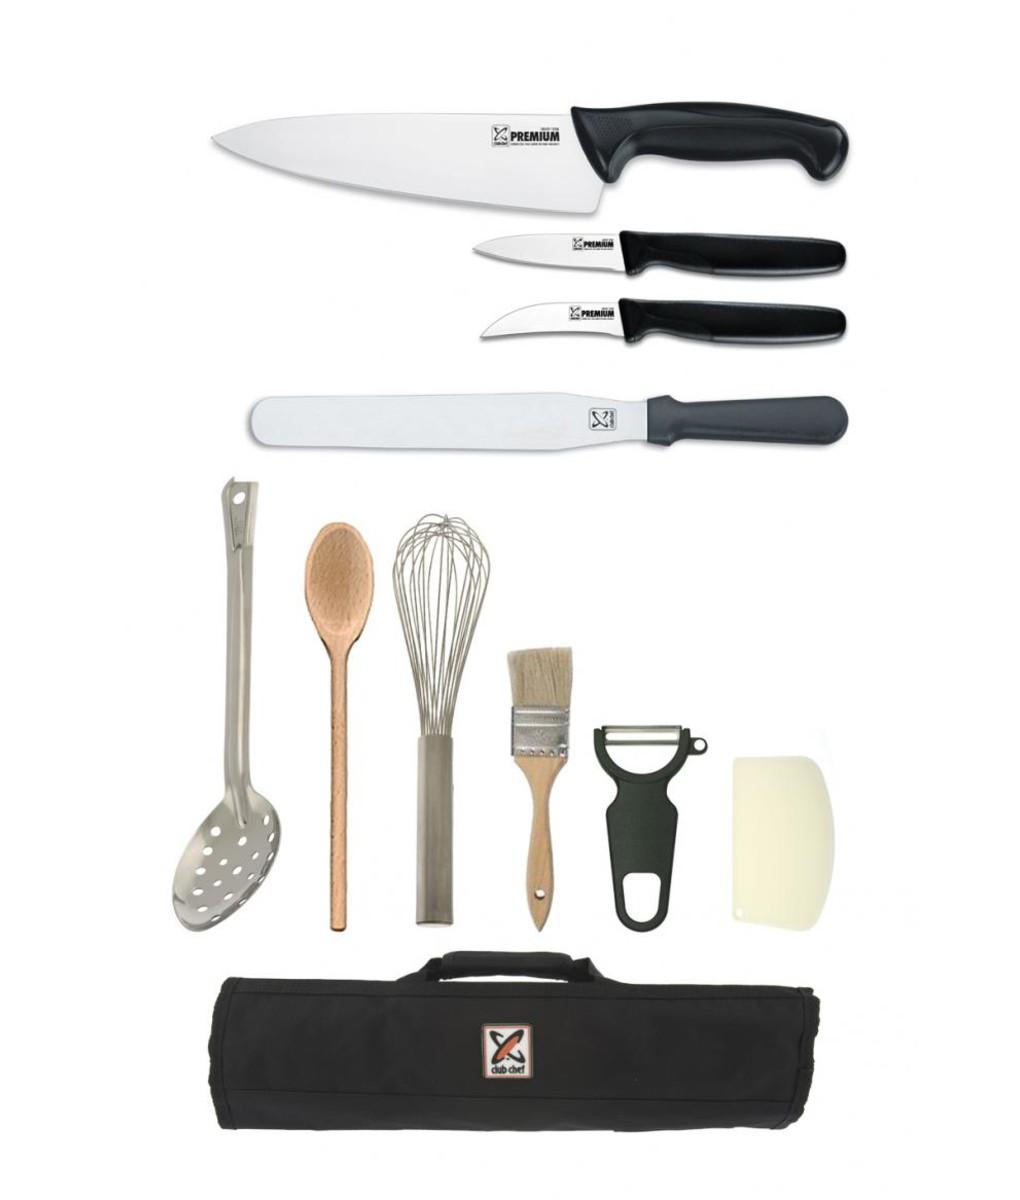 11 Piece Chef Starter Kit - Premium by Club Chef